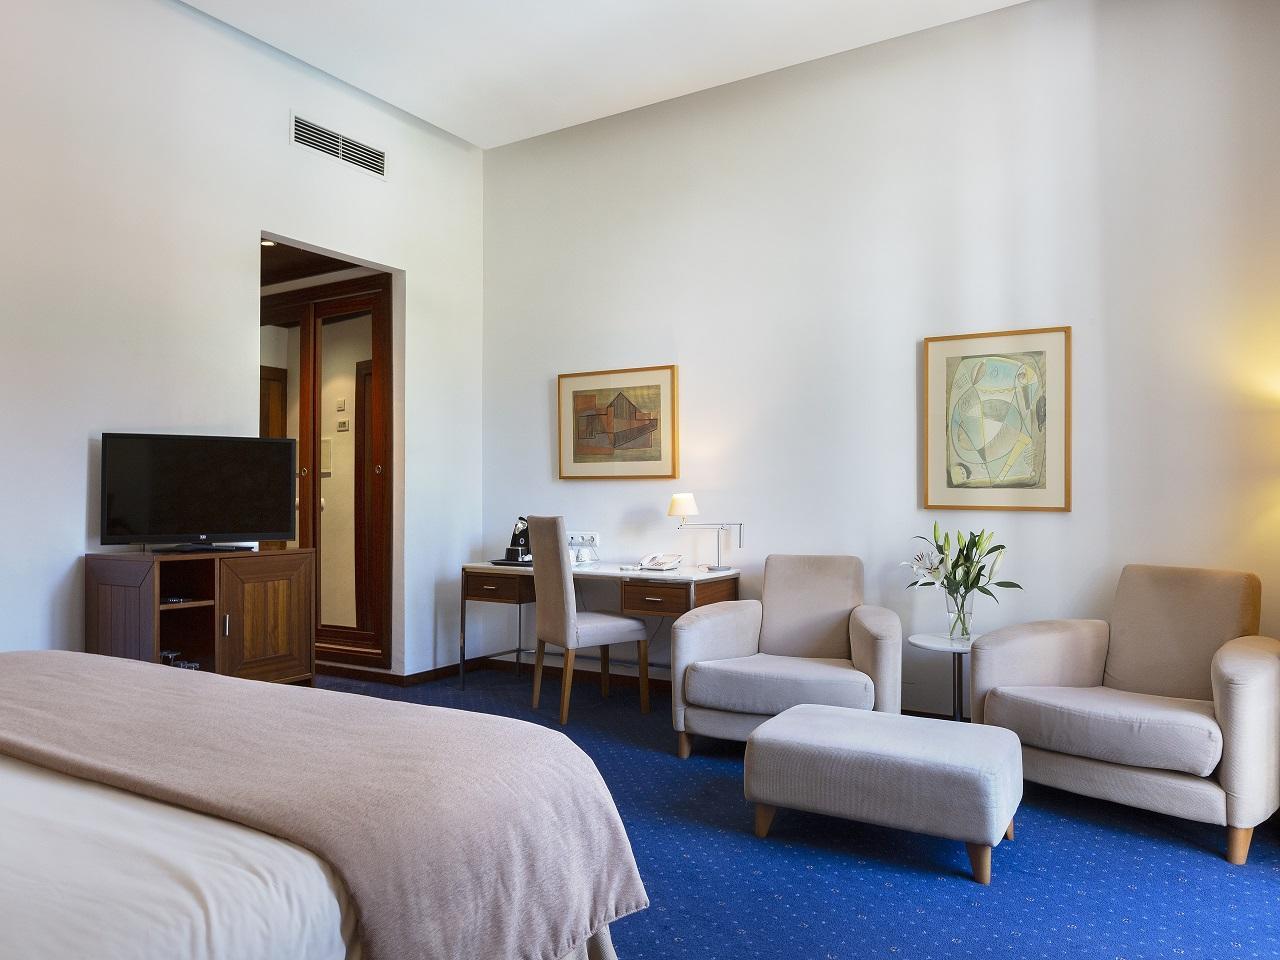 Double deluxe room at Gran Hotel Sóller in Sóller, Majorca